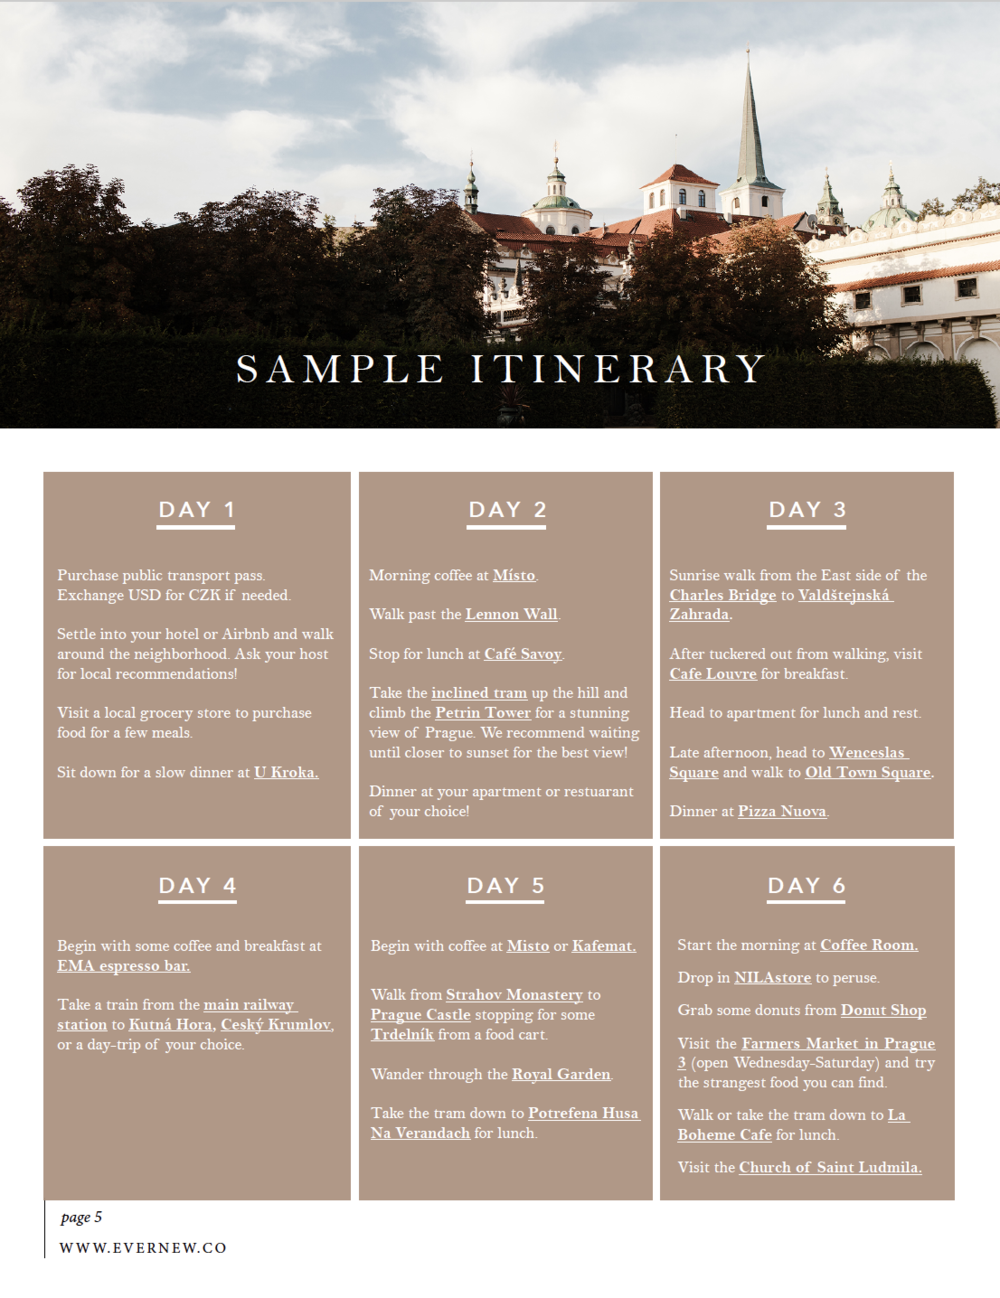 Sample Week Itinerary in Prague